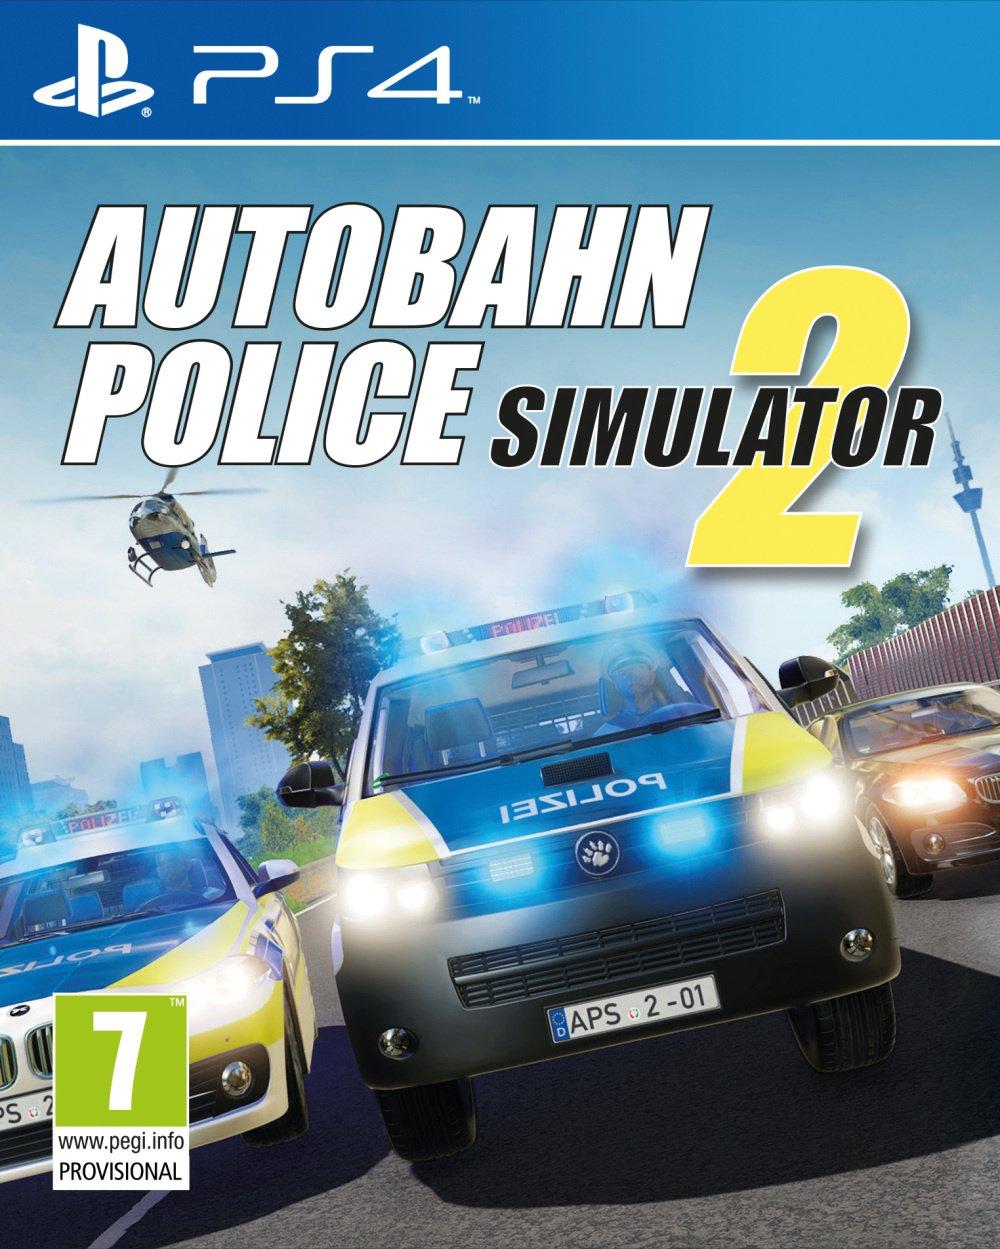 Bilde av Autobahn Police Simulator 2